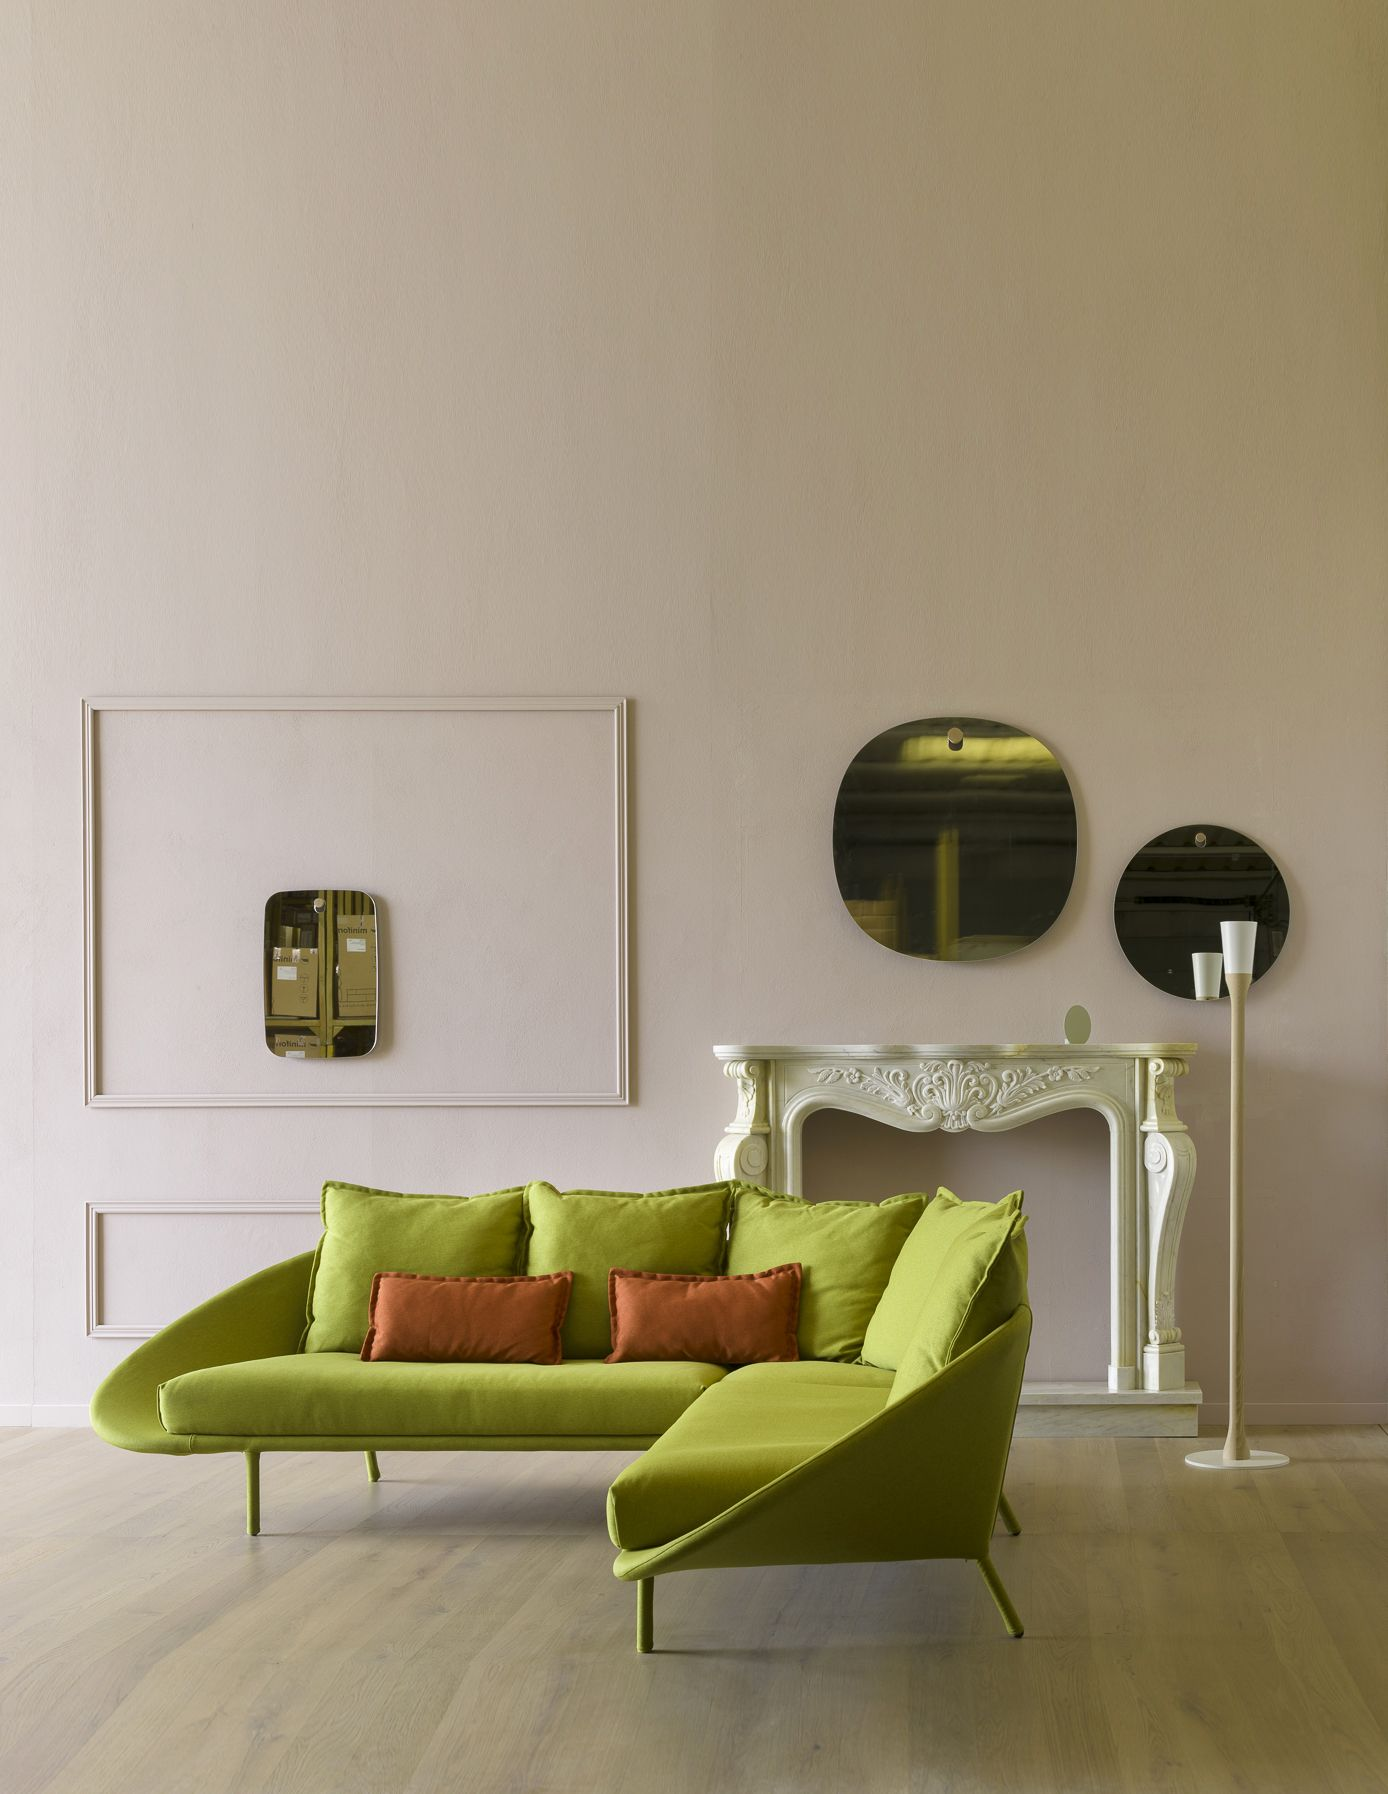 Lem Sofa In A Neo Classical Setting Miniforms Sofa Homedecor Interiordesign Interior Furniture White Interior Home Decor